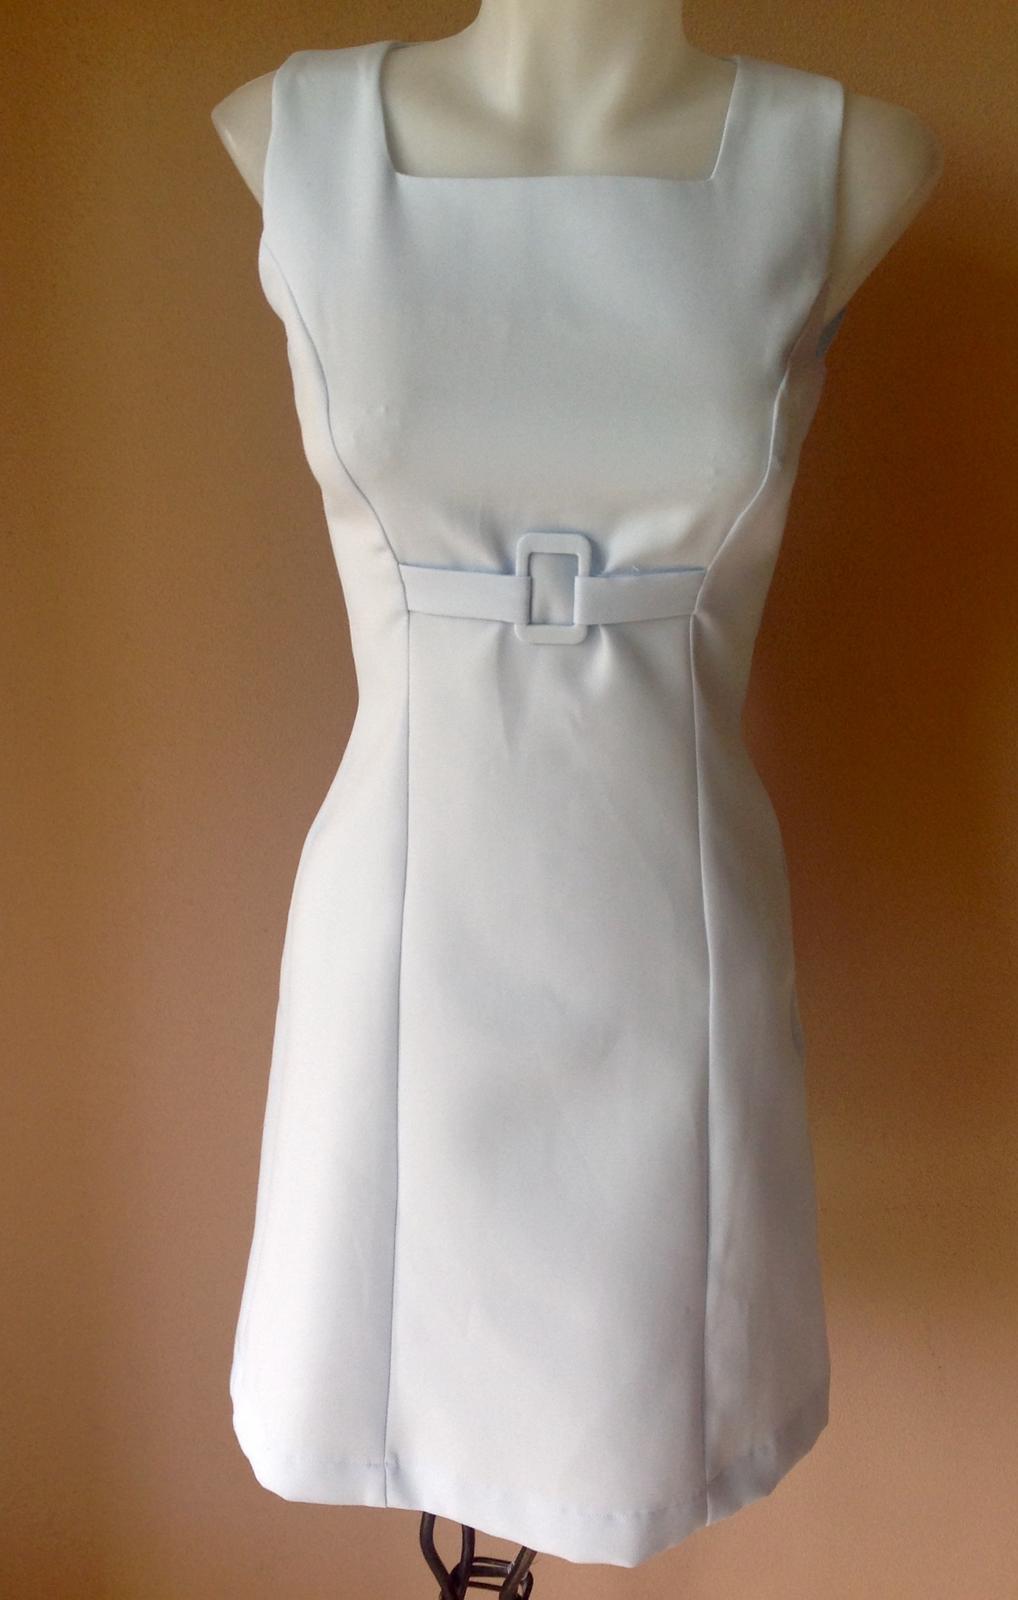 Šaty HENNES - Obrázok č. 1